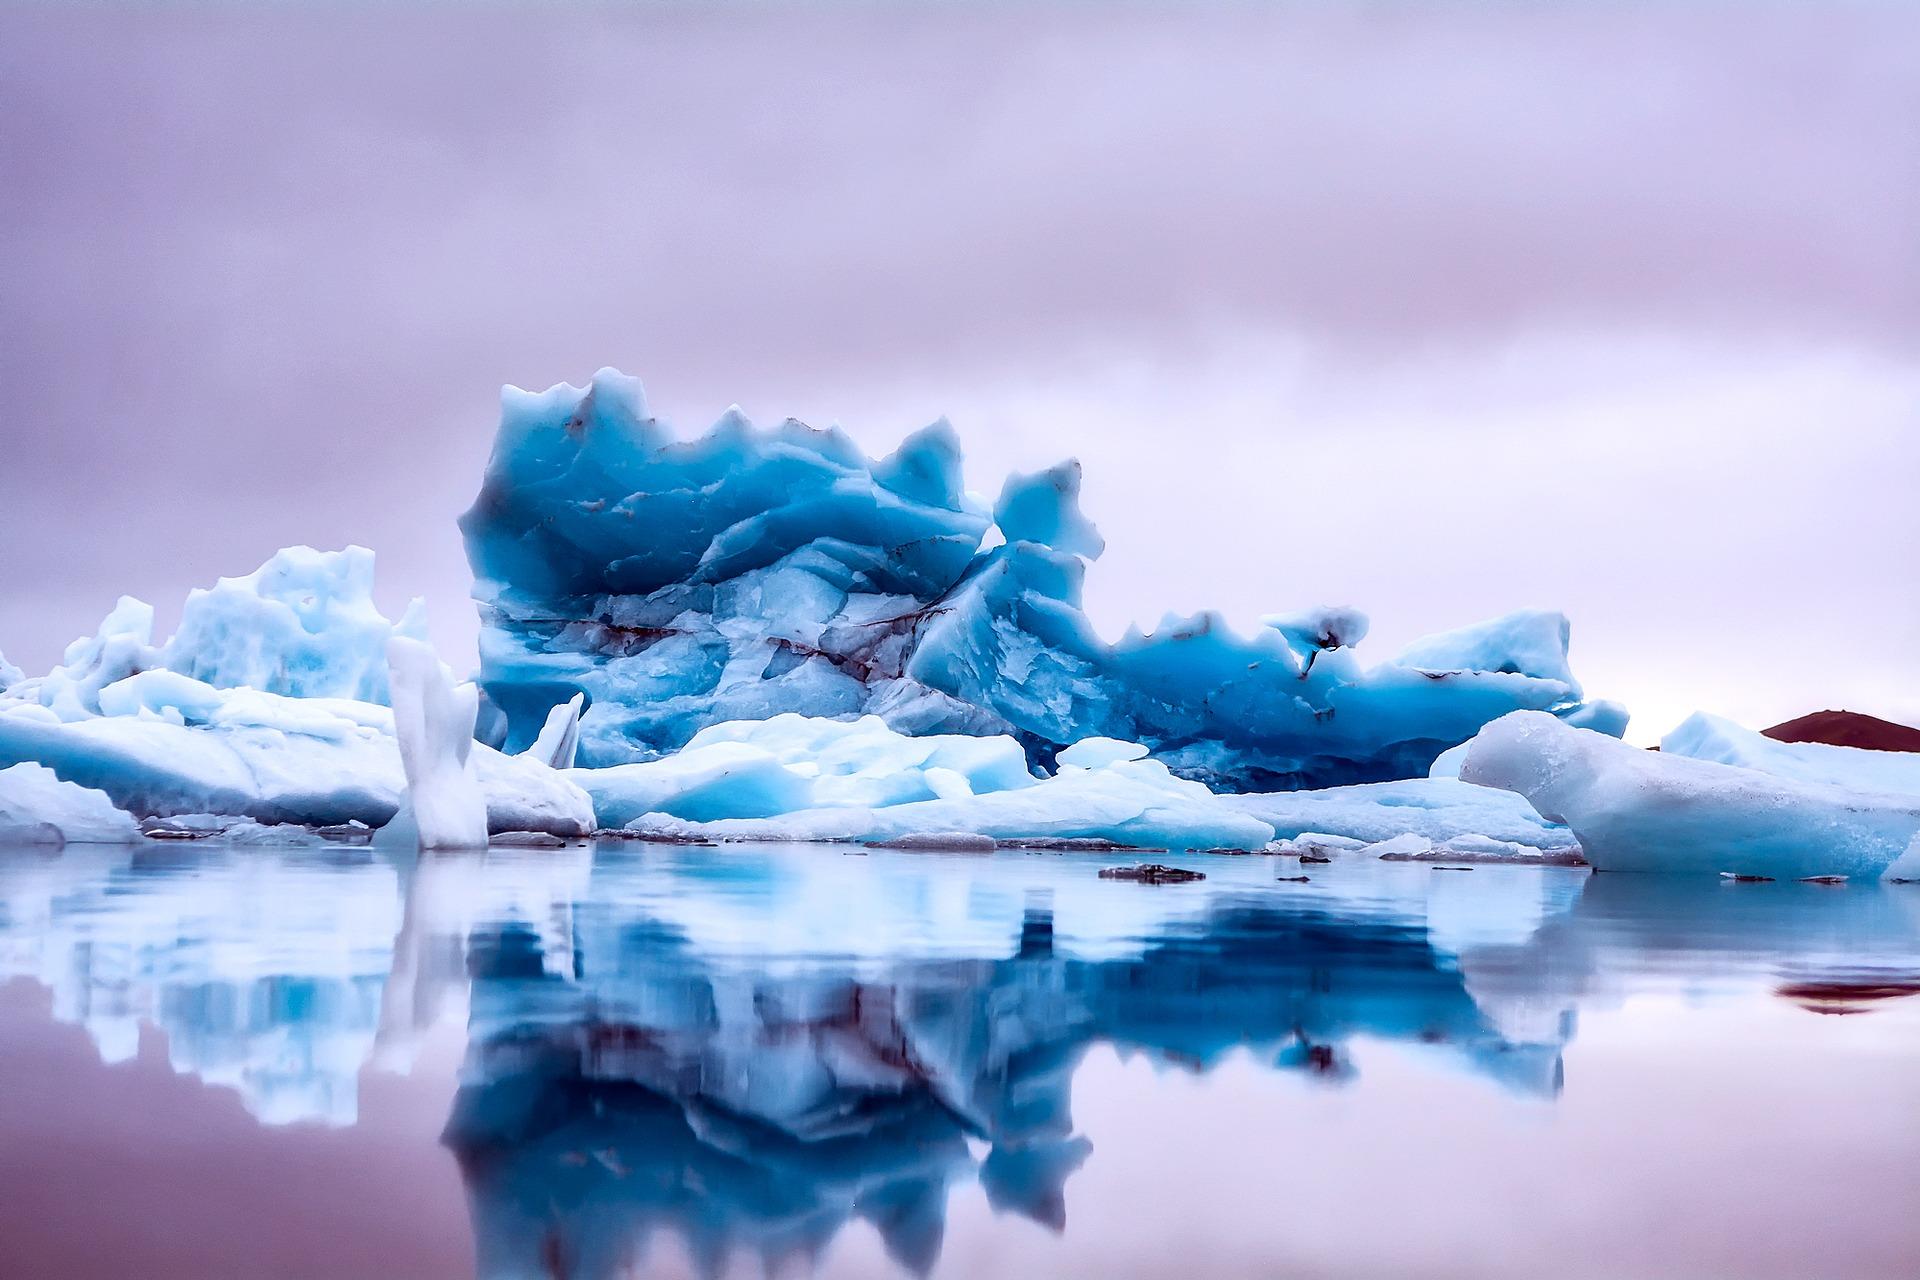 iceland-2287537_1920.jpg